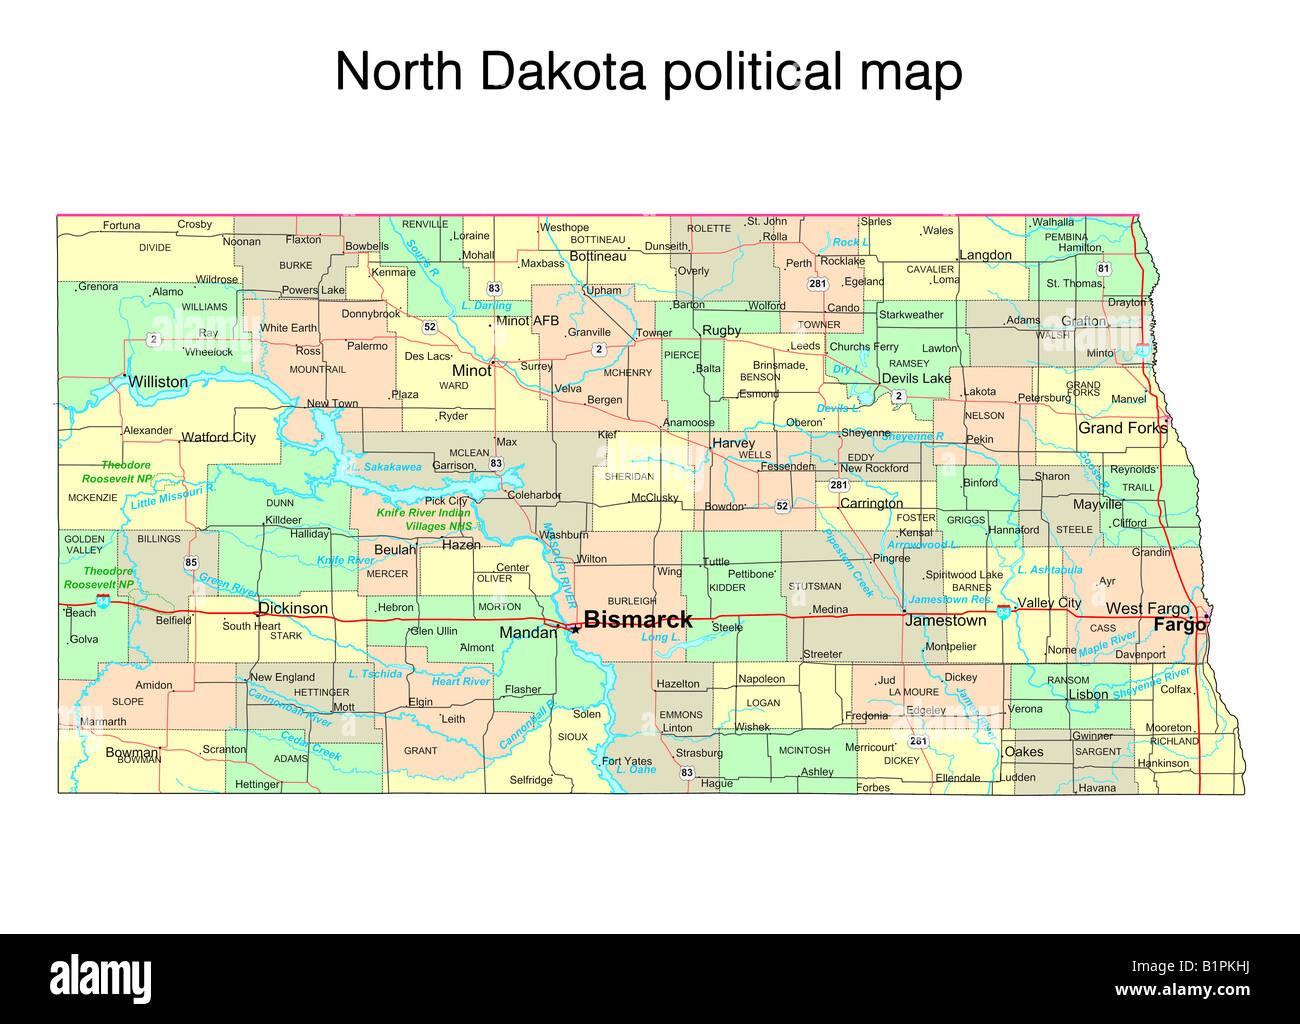 North Dakota state political map Stock Photo: 18323358 - Alamy